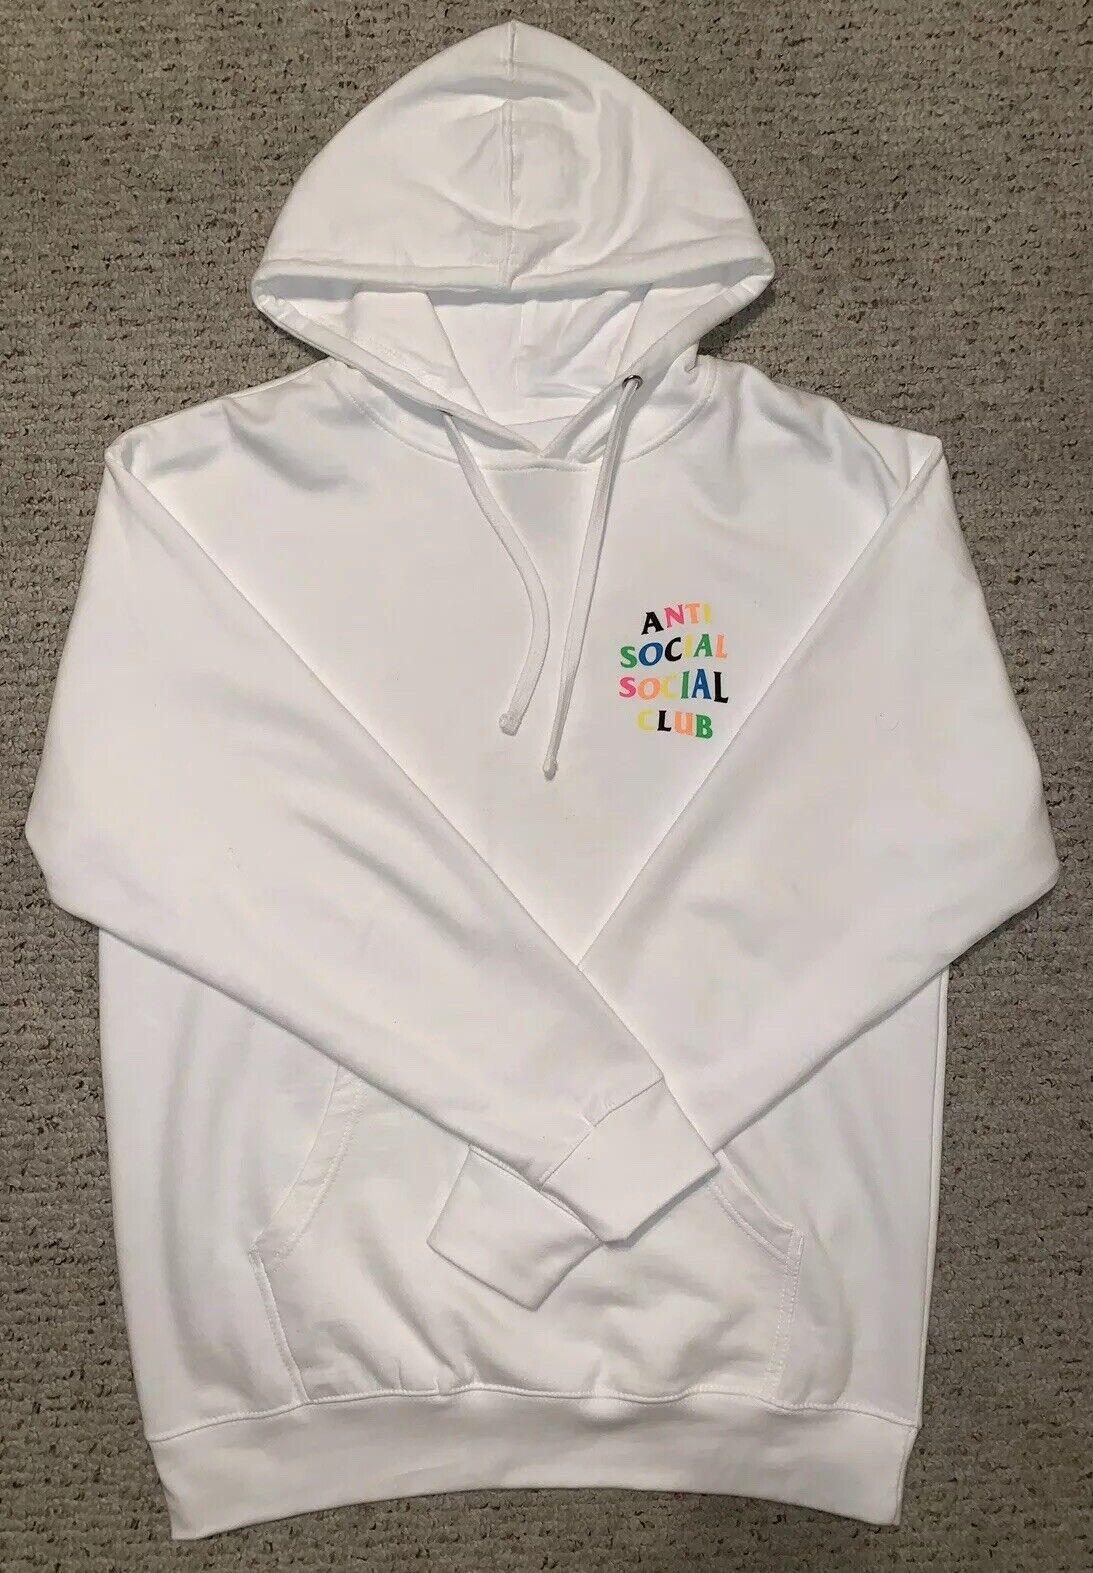 ASSC Anti Social Social Club Rainy Dayz Weiß Rainbow Hoodie groß Multi 1 2 3 4